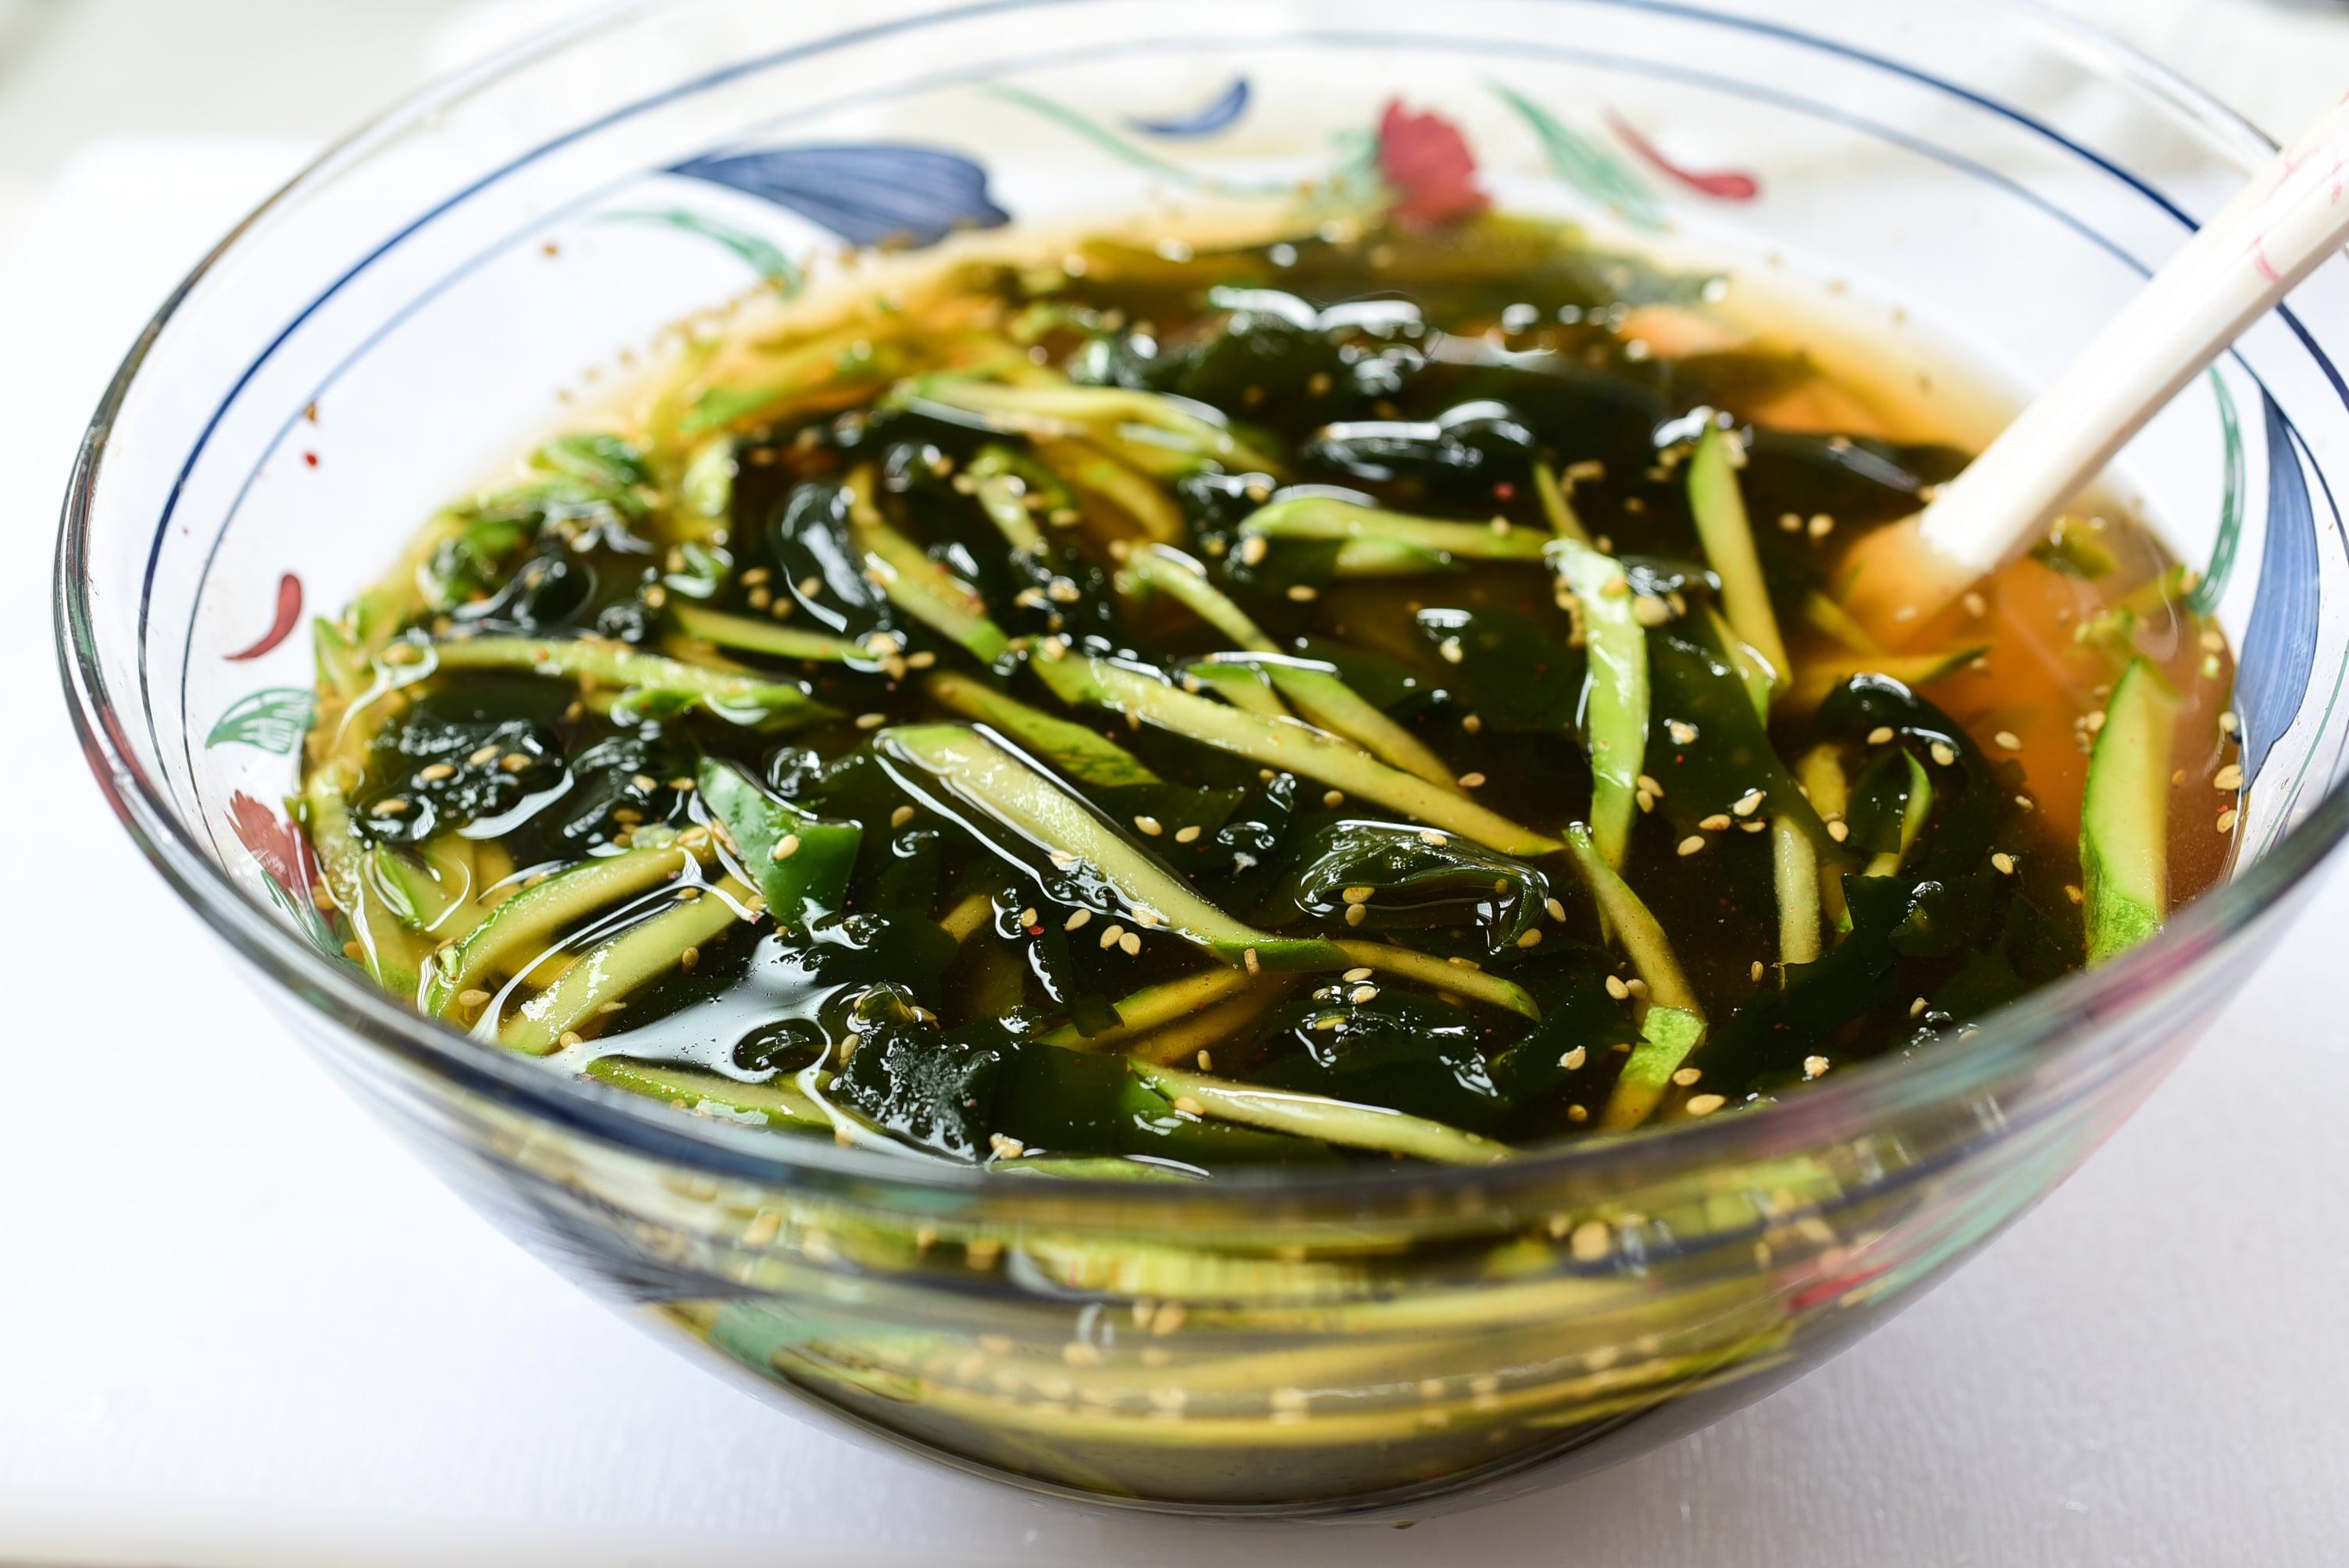 DSC 4925 - Oi Naengguk (Chilled Cucumber Soup)